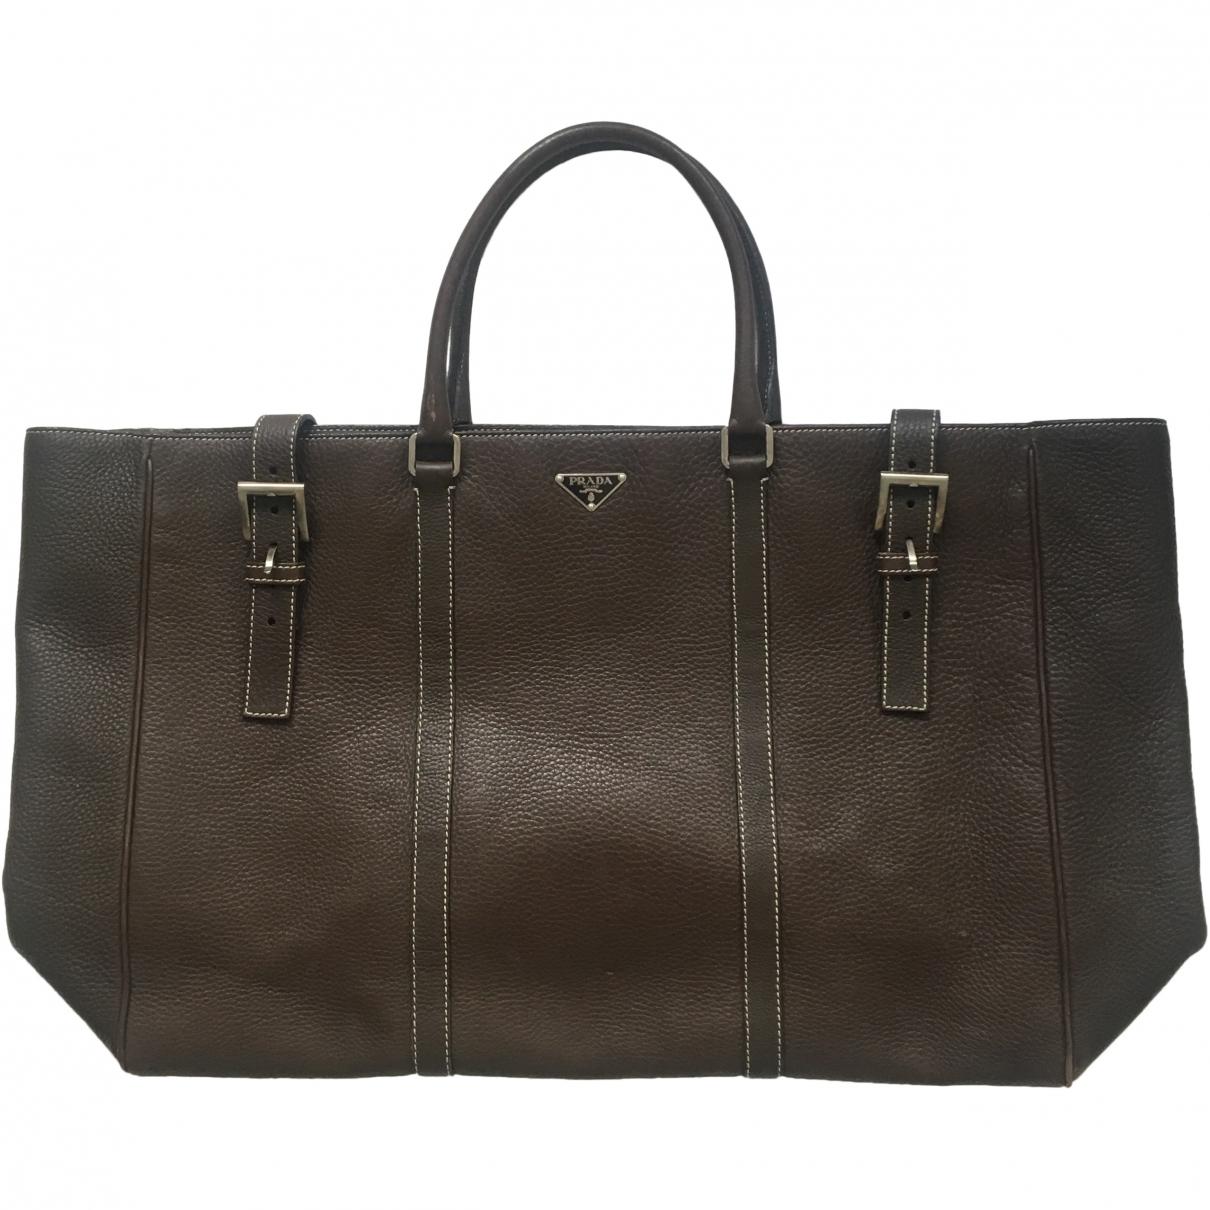 Prada \N Brown Leather bag for Men \N